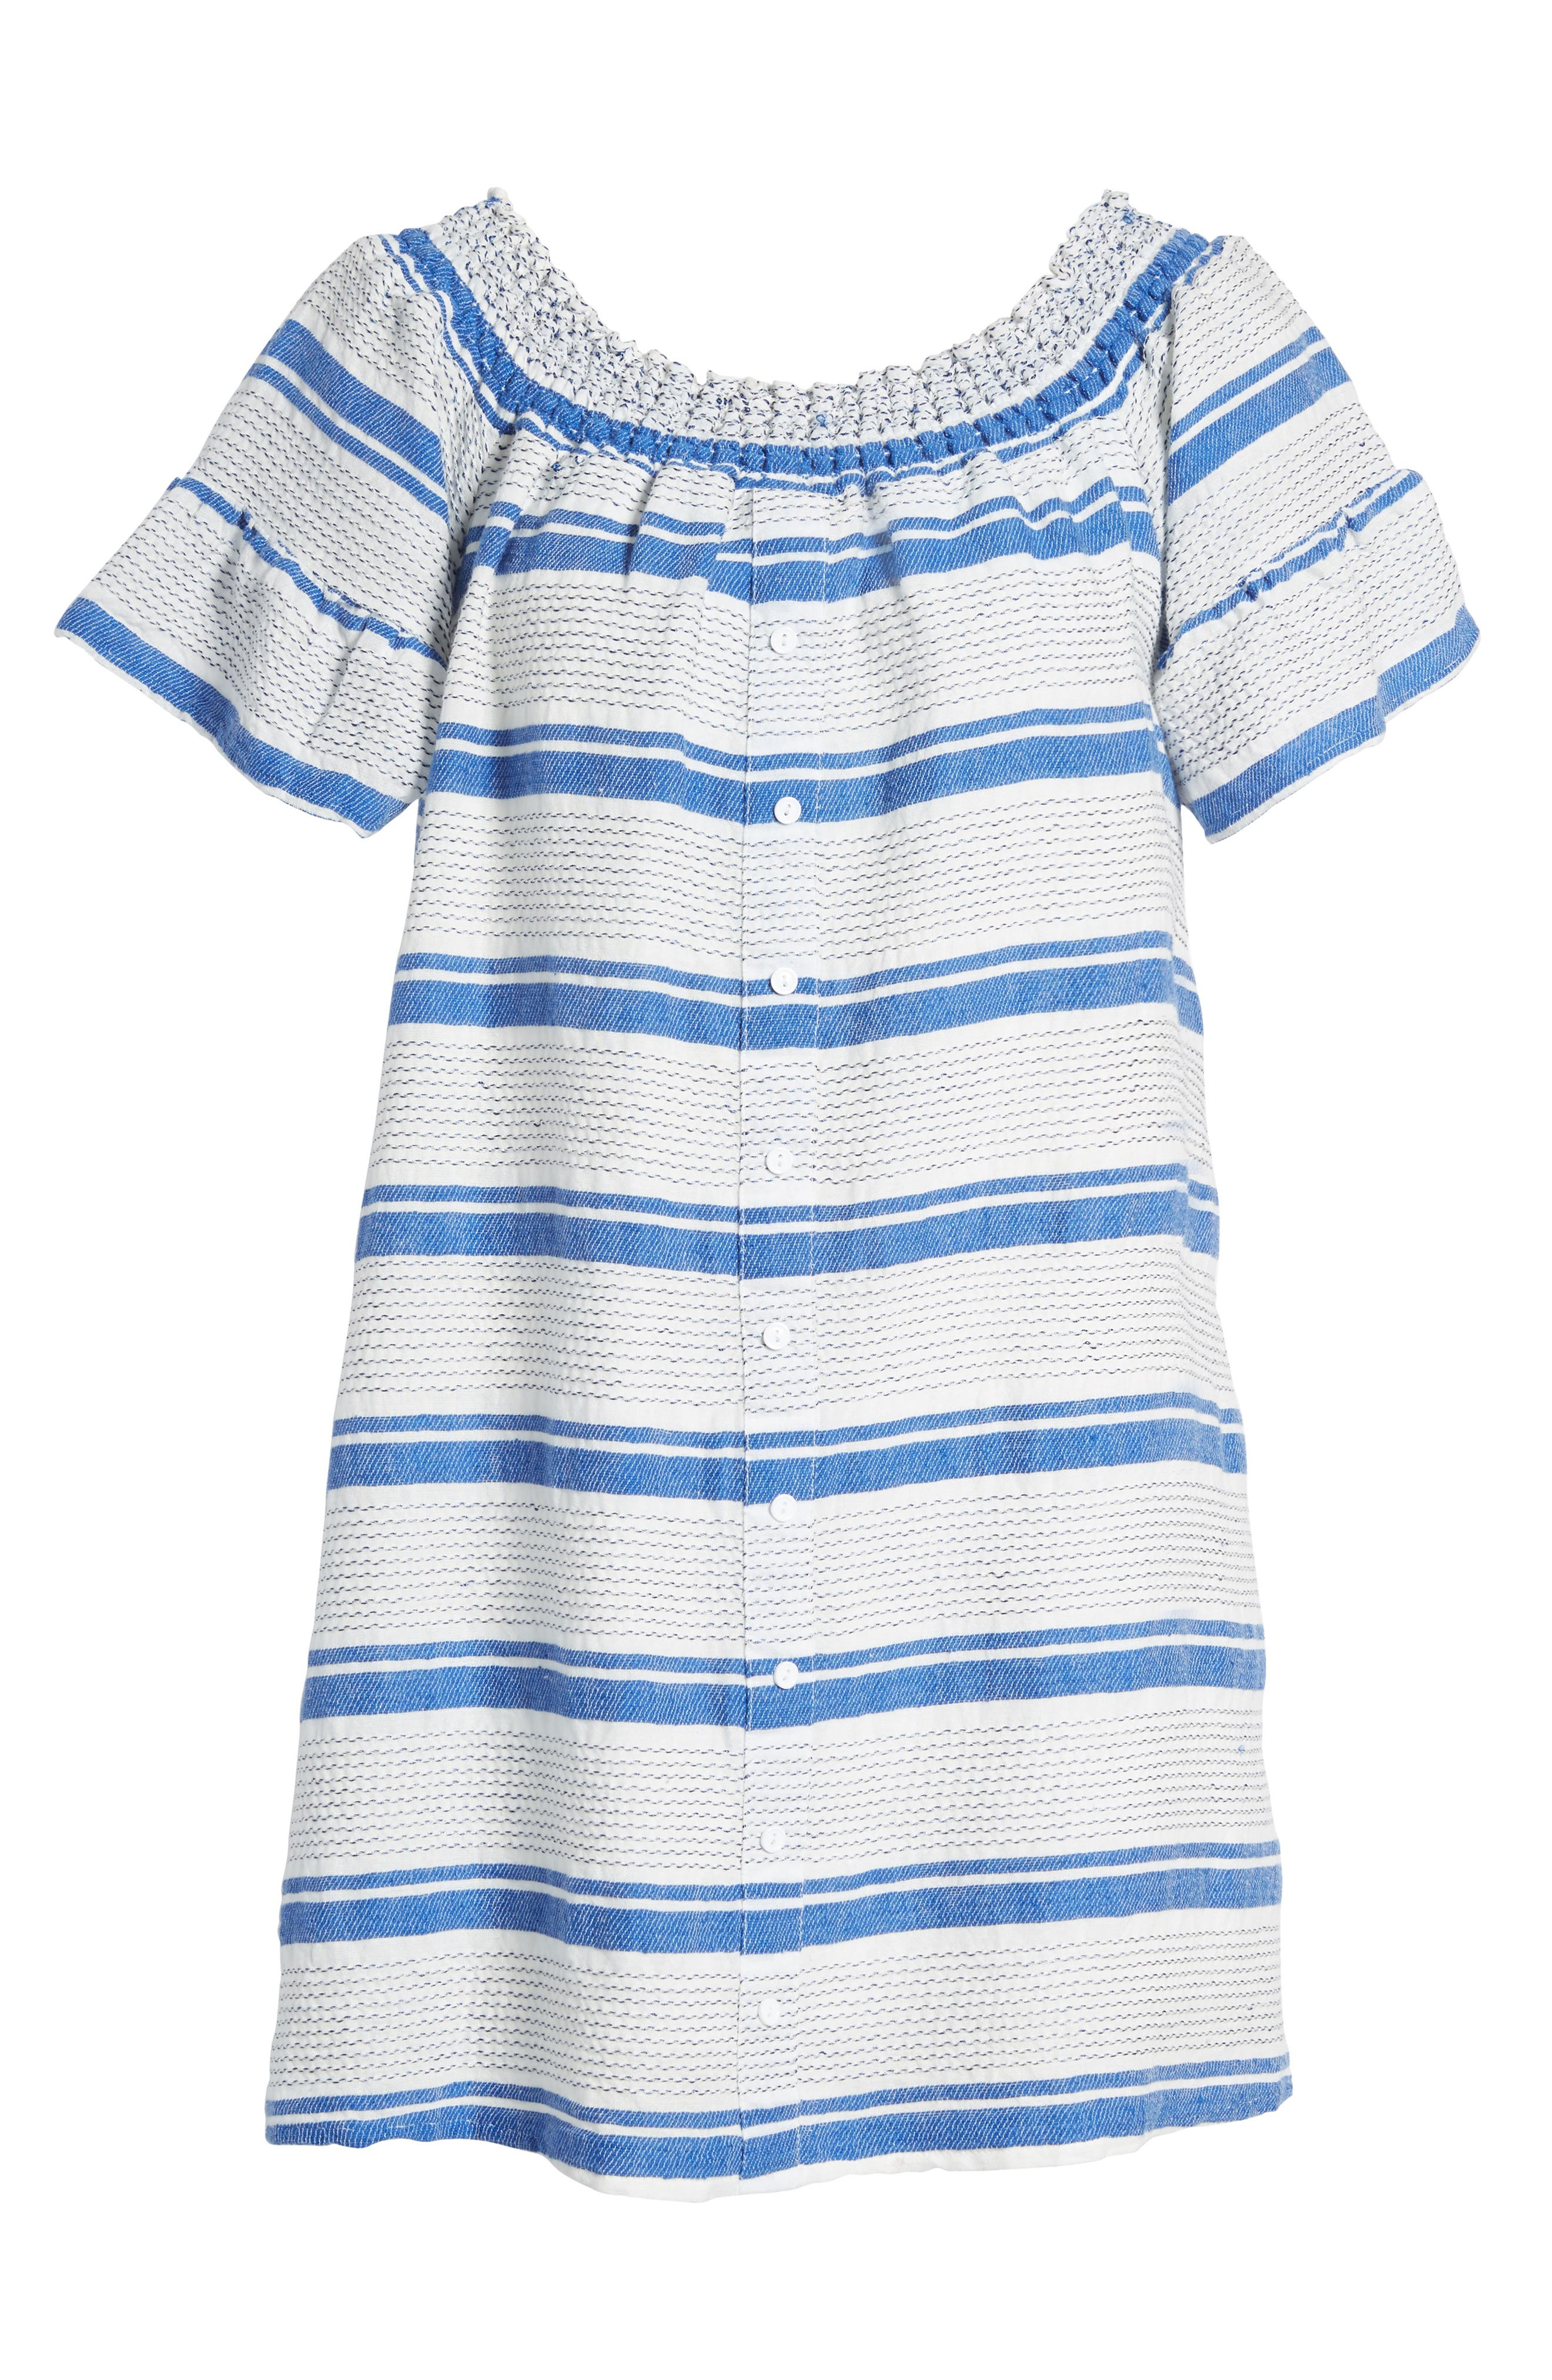 Bora Bora Off the Shoulder Dress,                             Alternate thumbnail 6, color,                             Blue/ White